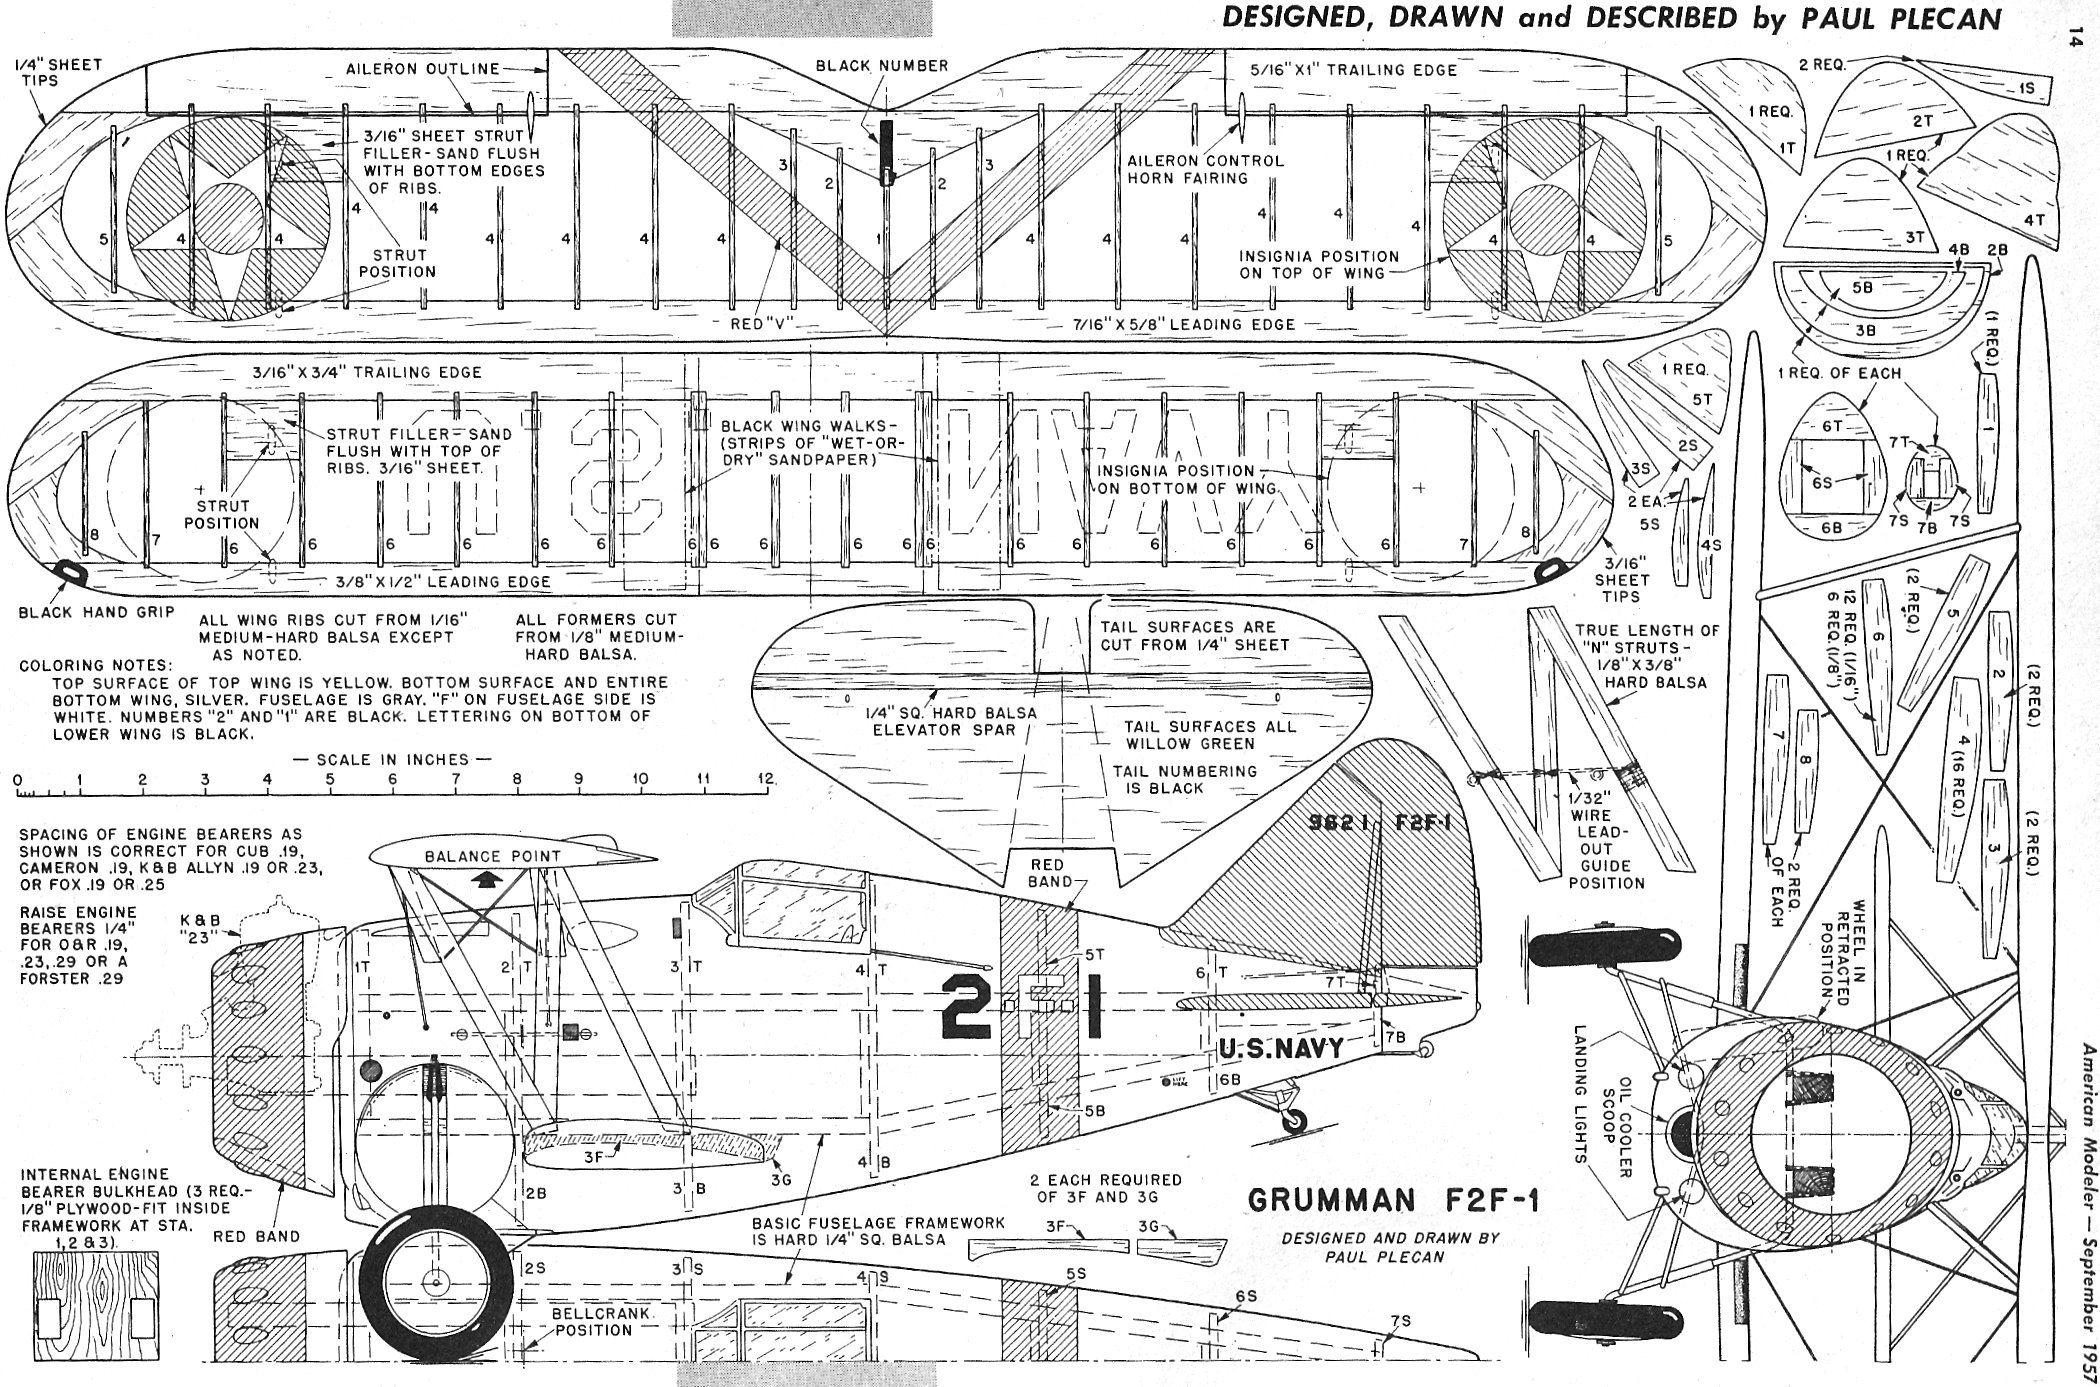 Wkp Bu Balsa Ahsap Tekne Model Planlari Model Boat Plans Model Airplanes Kit Model Boats